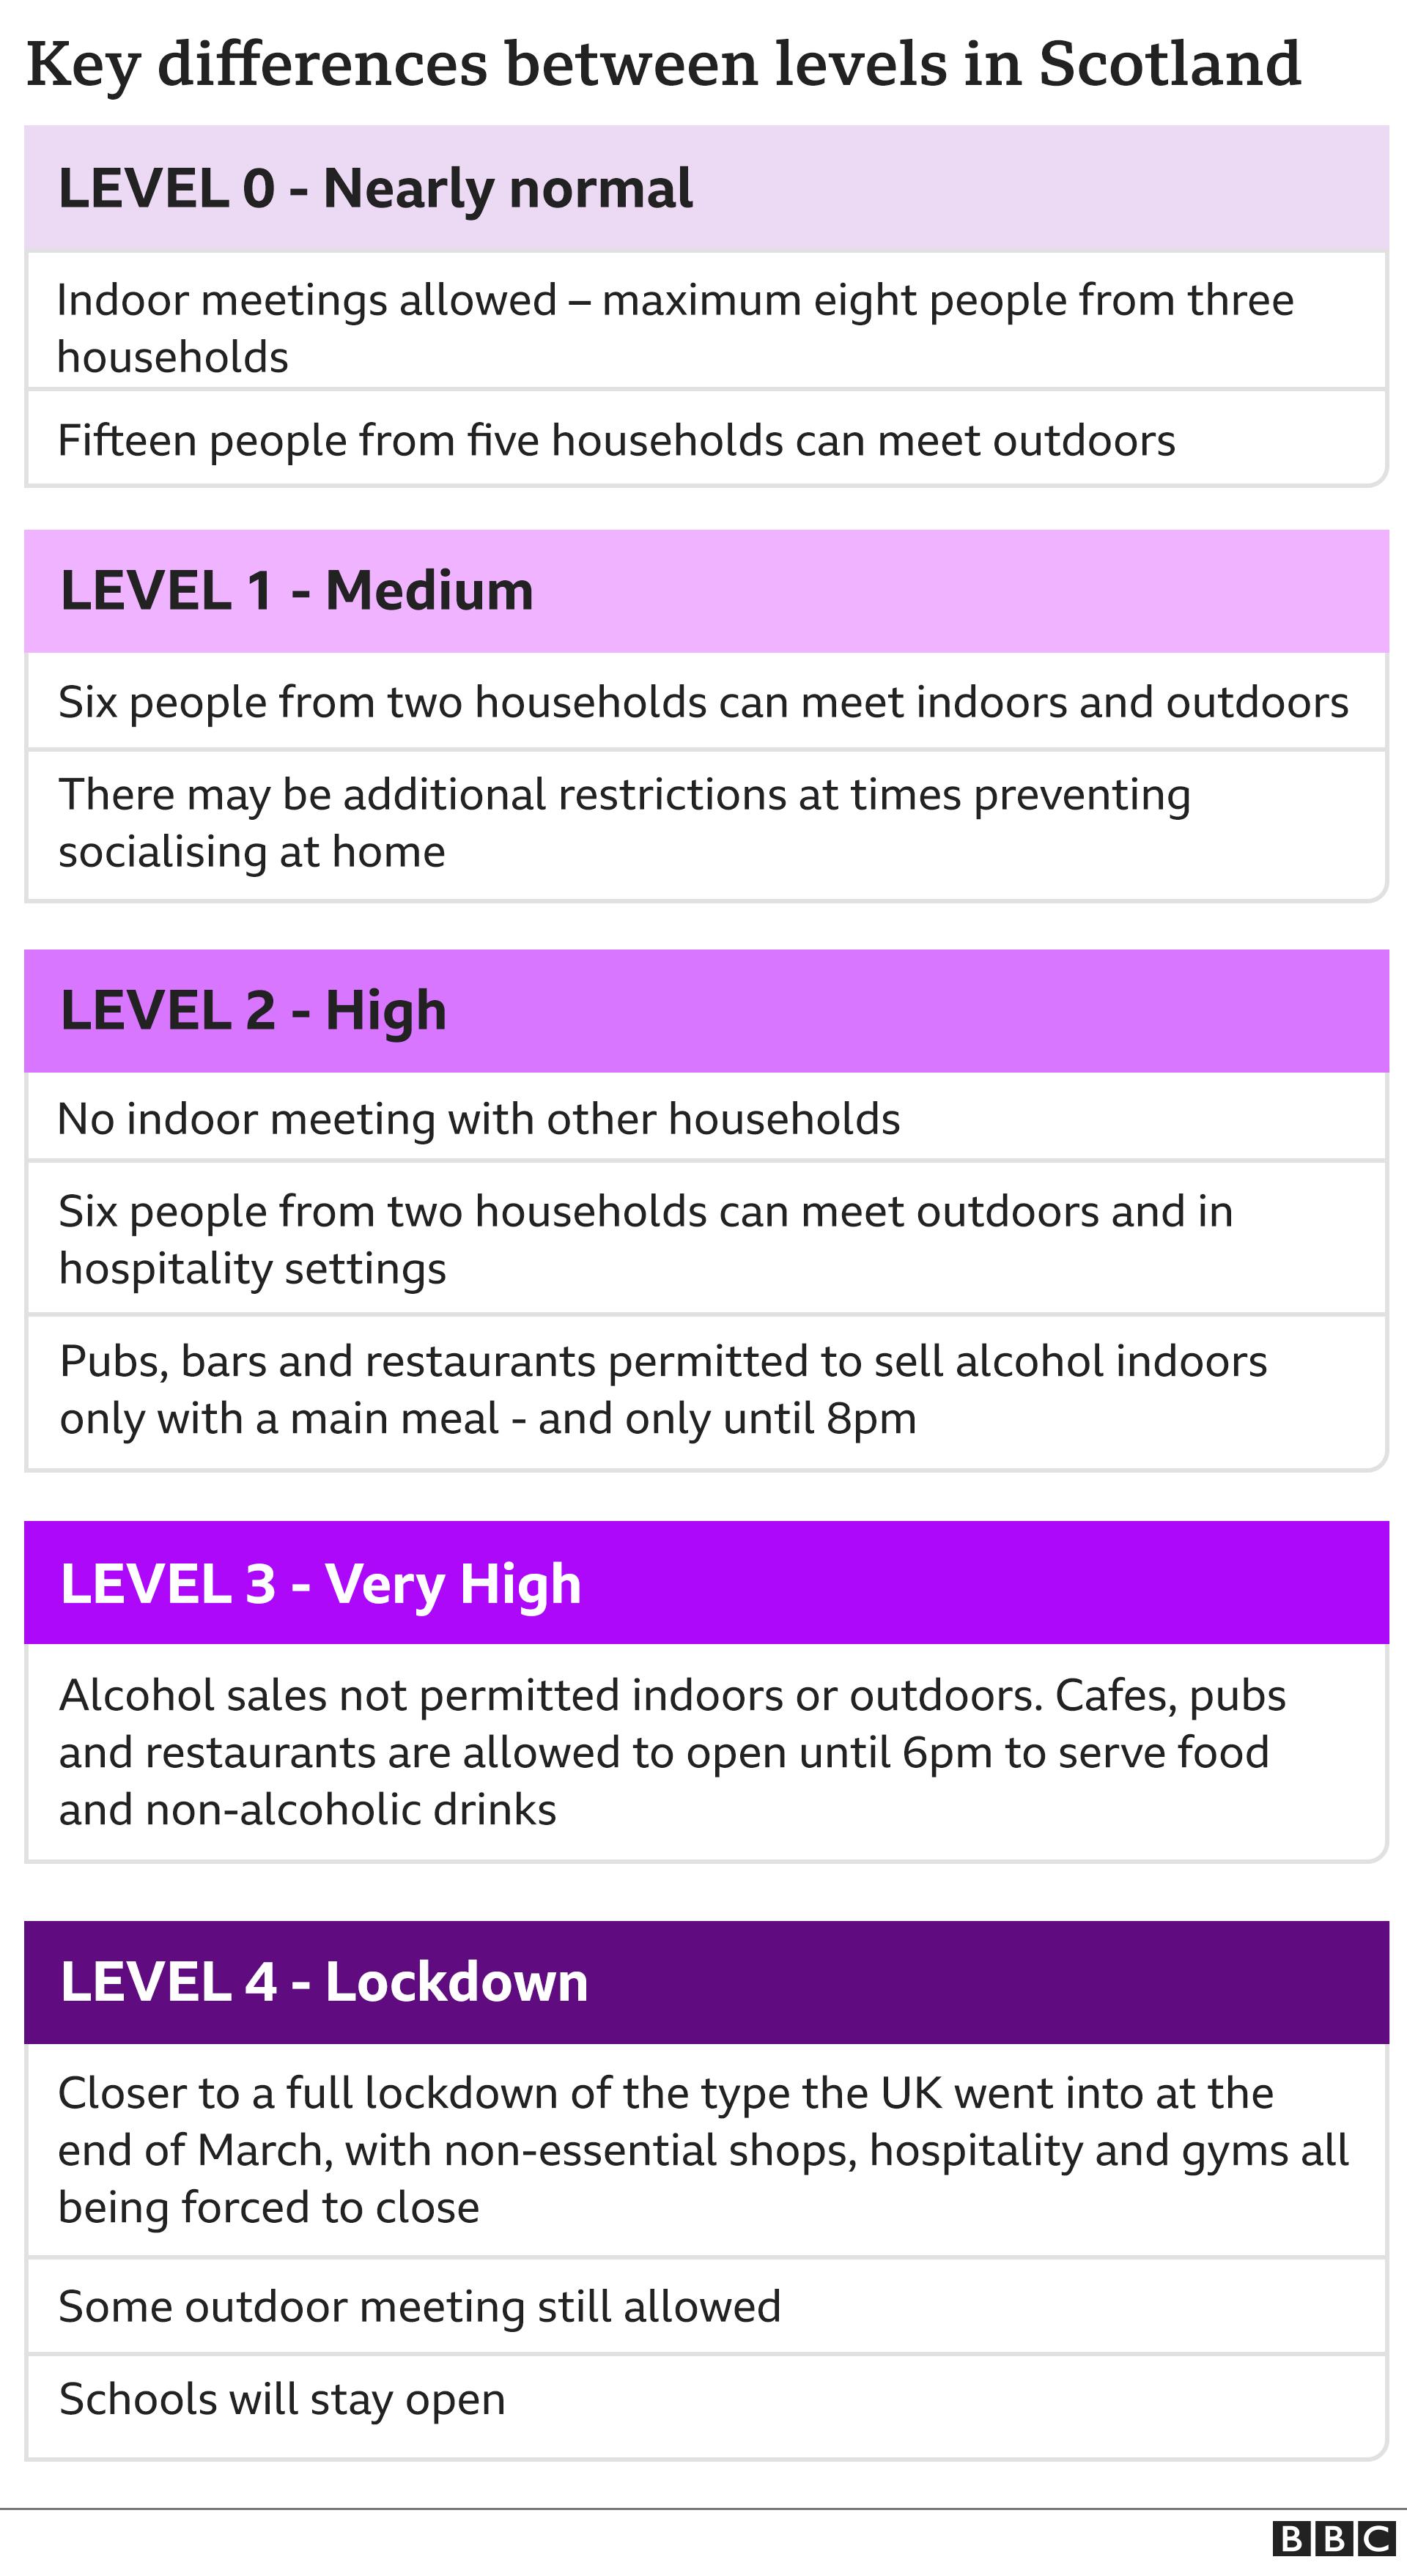 level 3 restrictions. scotland - photo #27